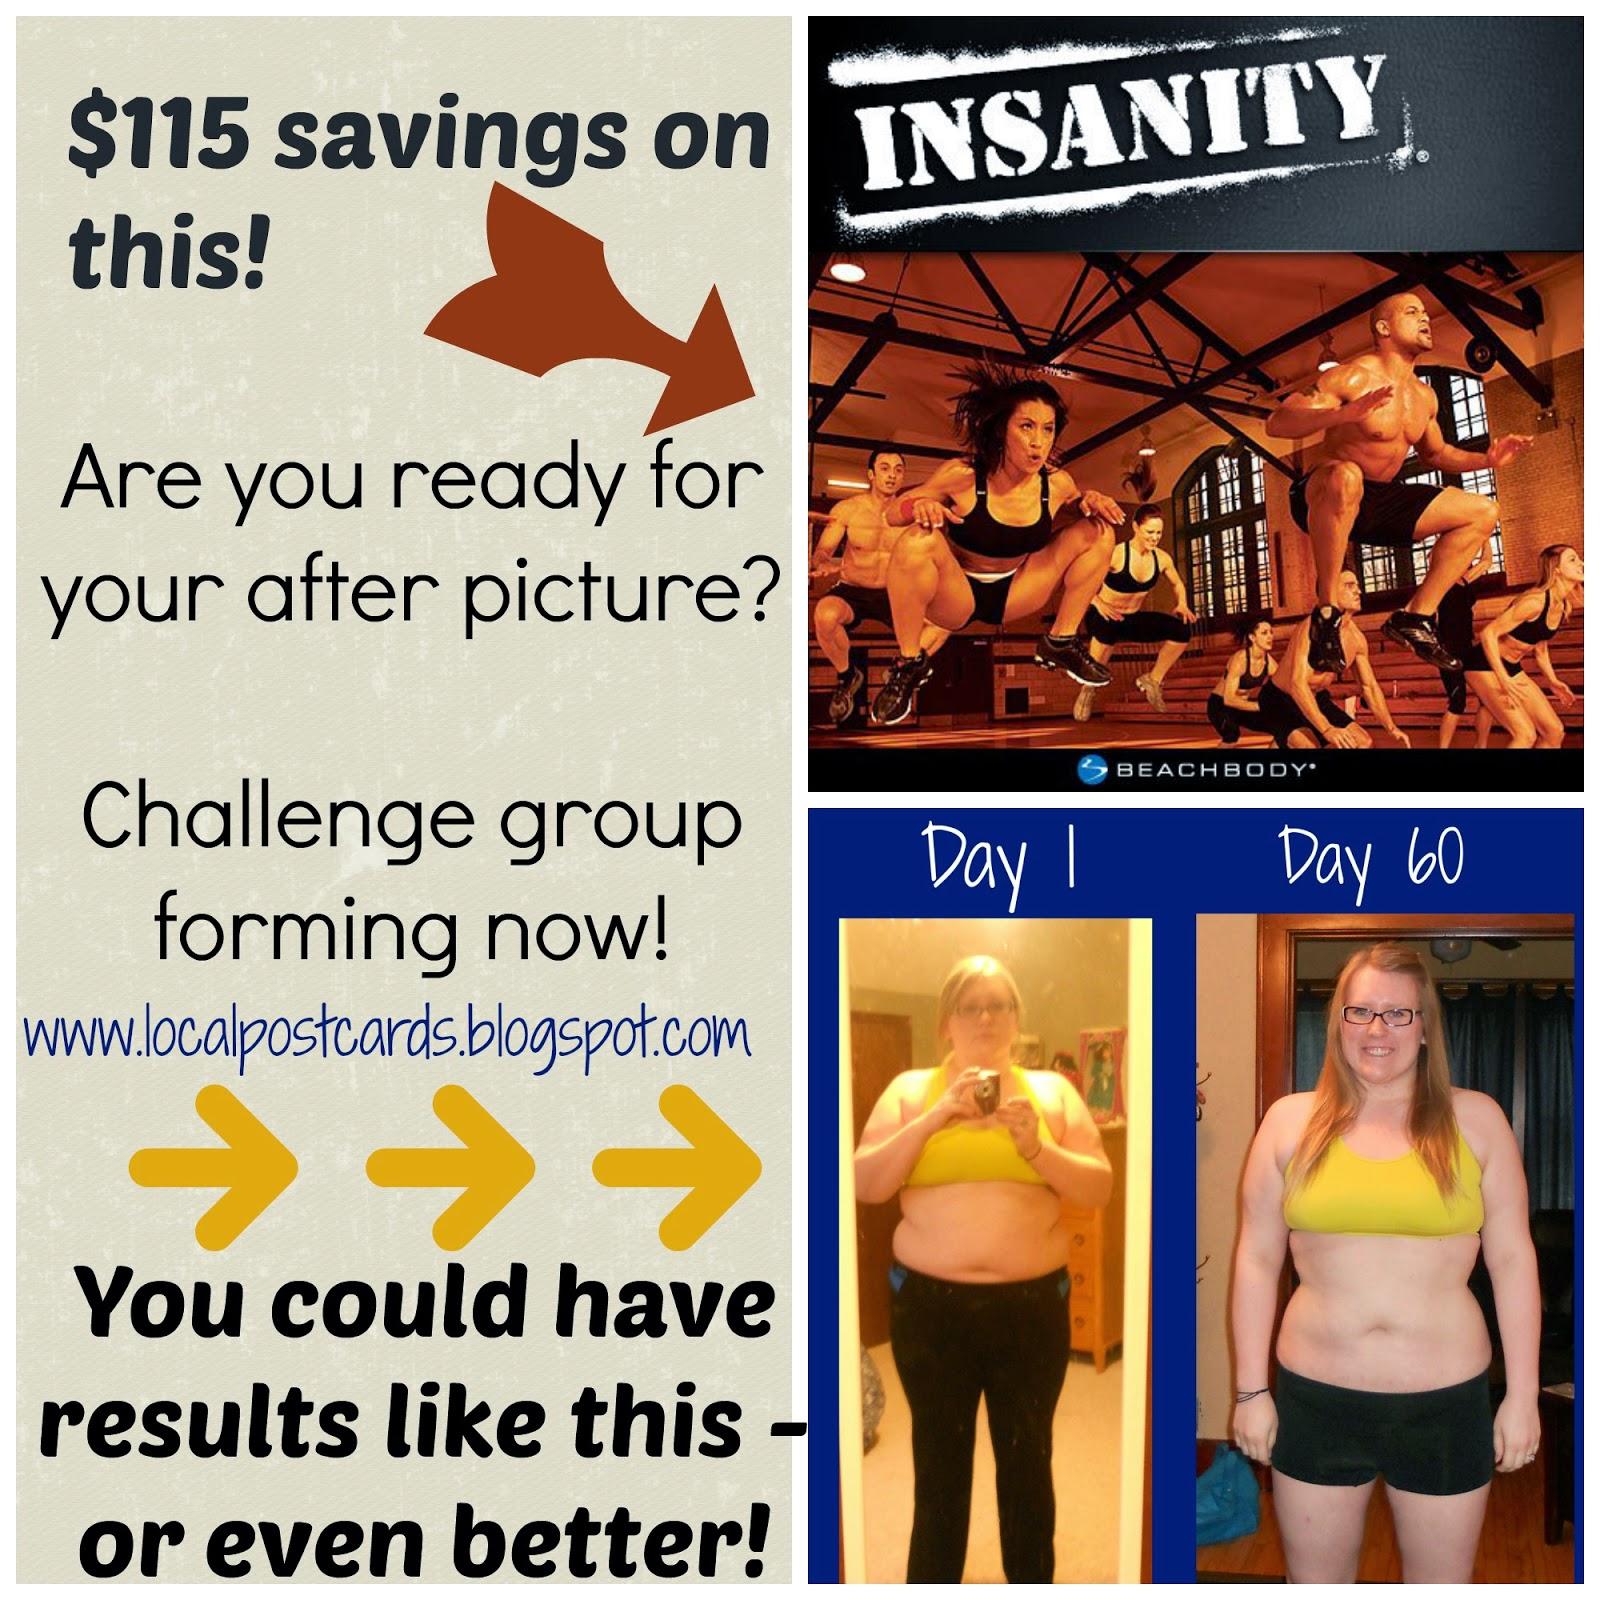 Insanity Challenge Group